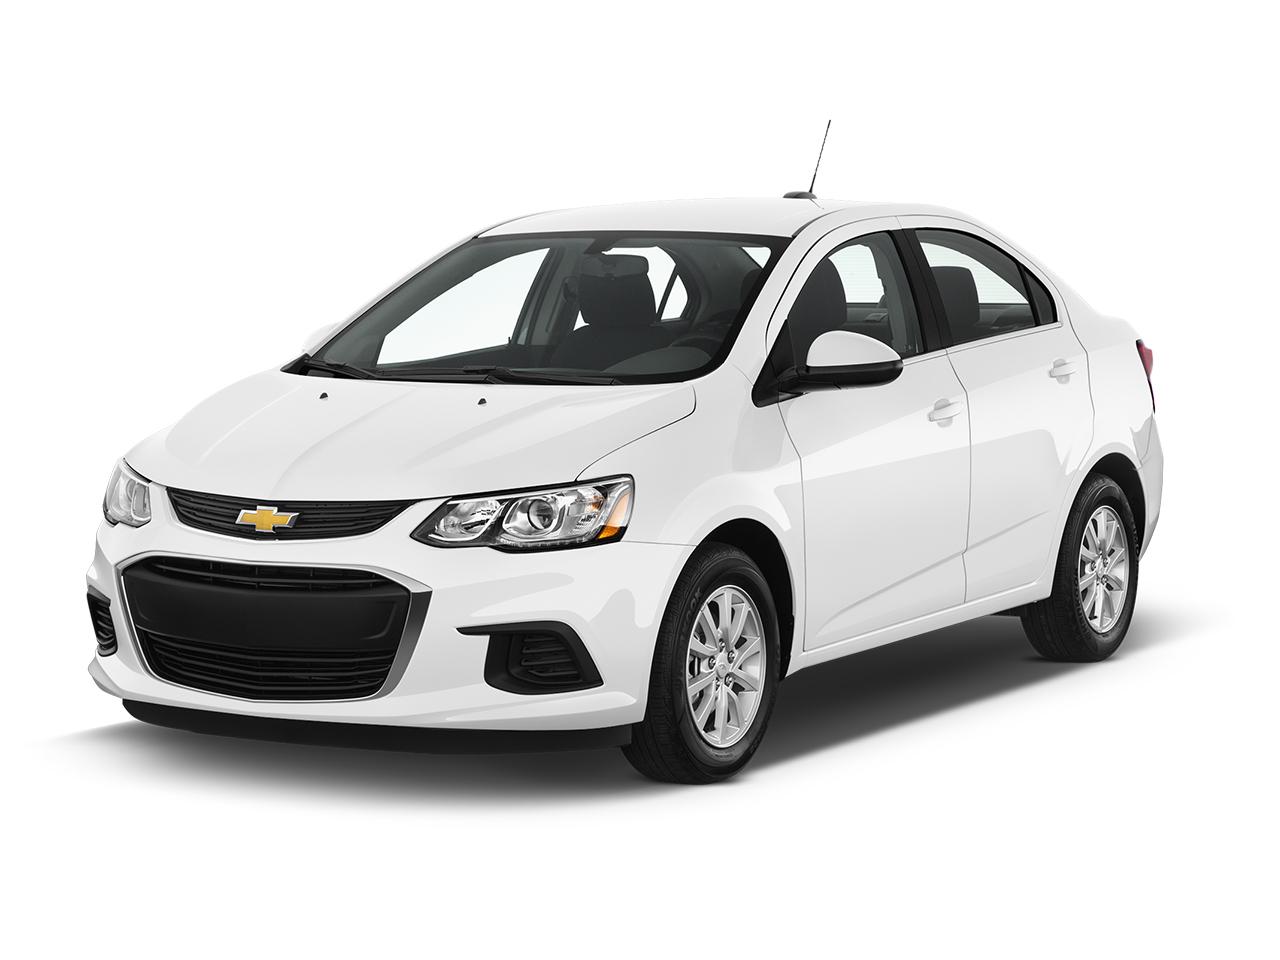 All Chevy chevy aveo 2006 : 2018 Chevrolet Aveo Prices in Saudi Arabia, Gulf Specs & Reviews ...